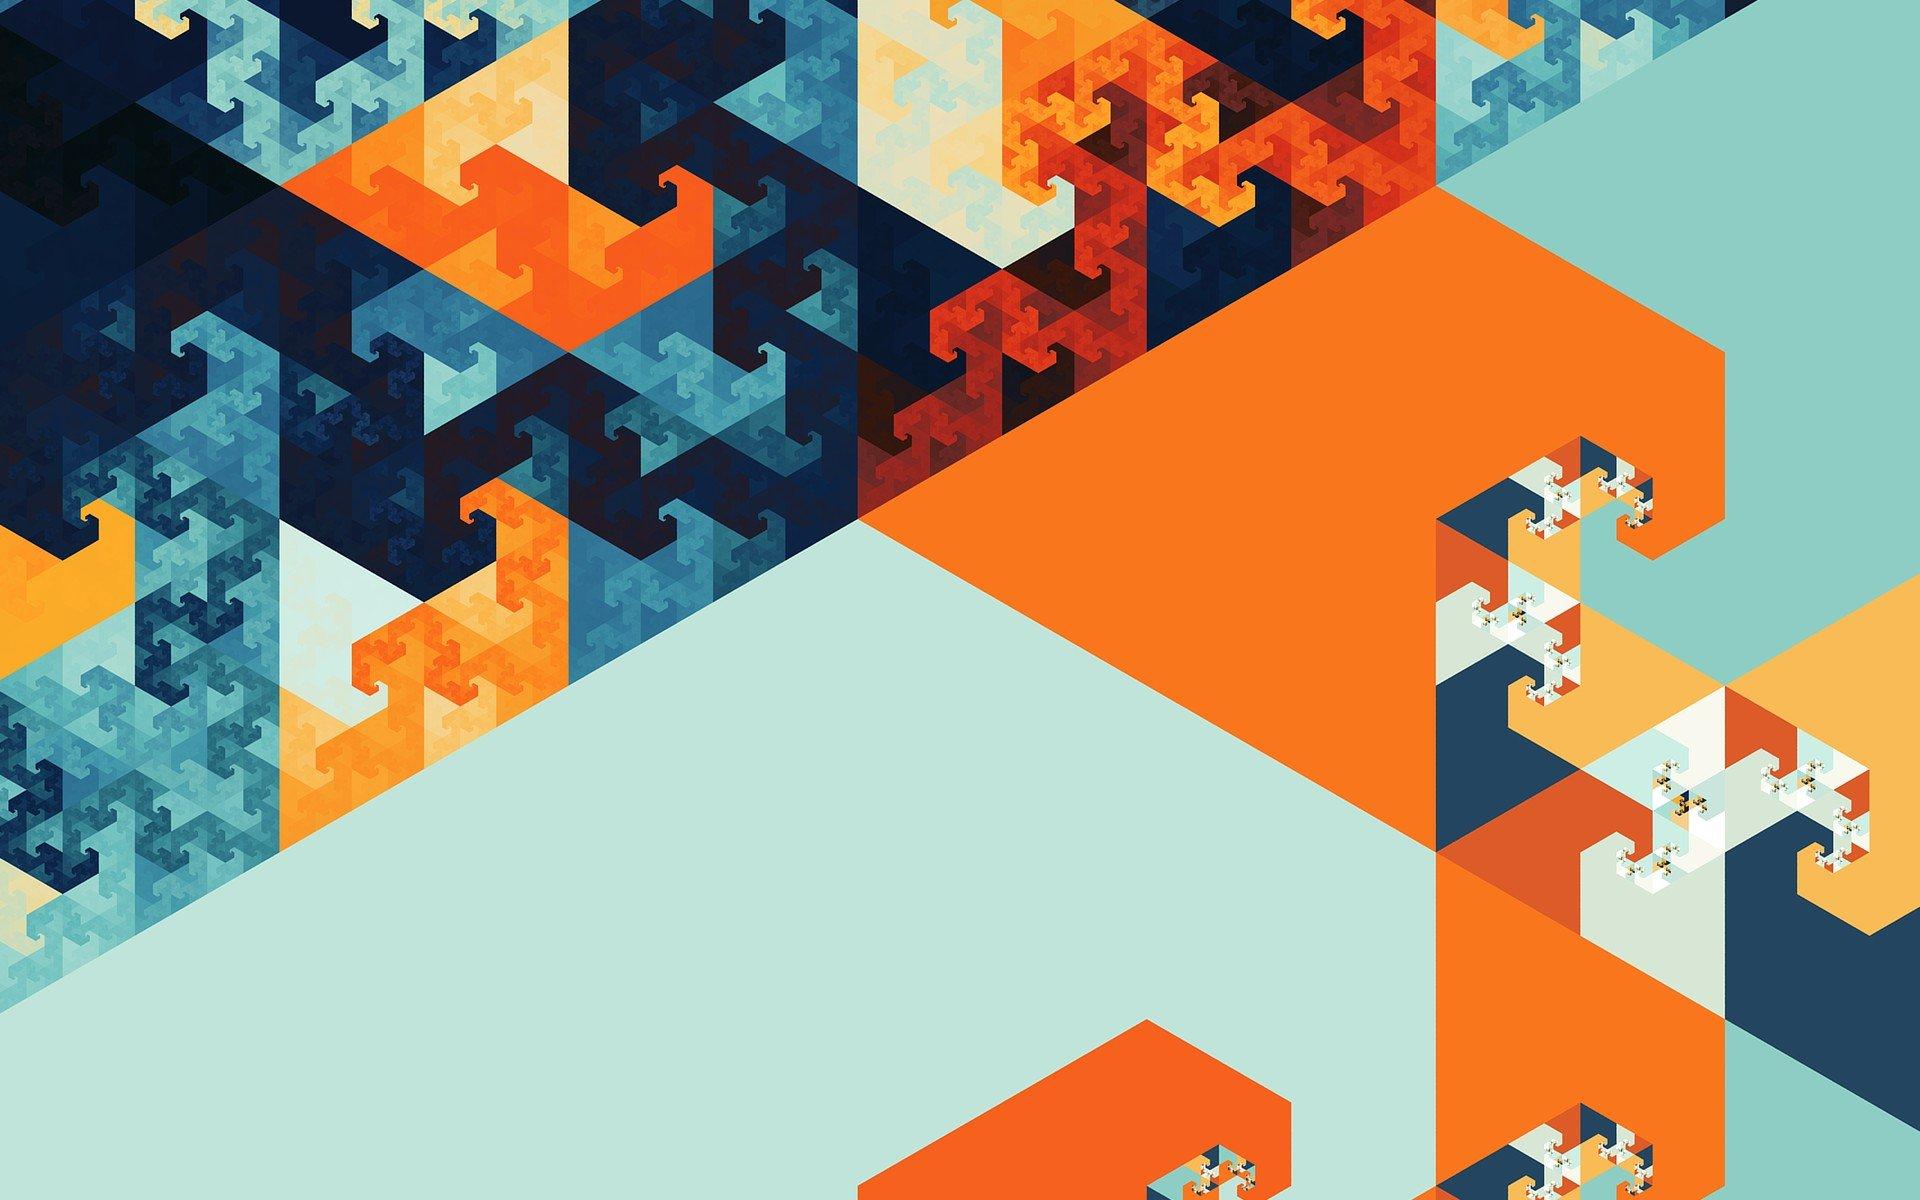 abstract fractal blue orange hd wallpapers desktop